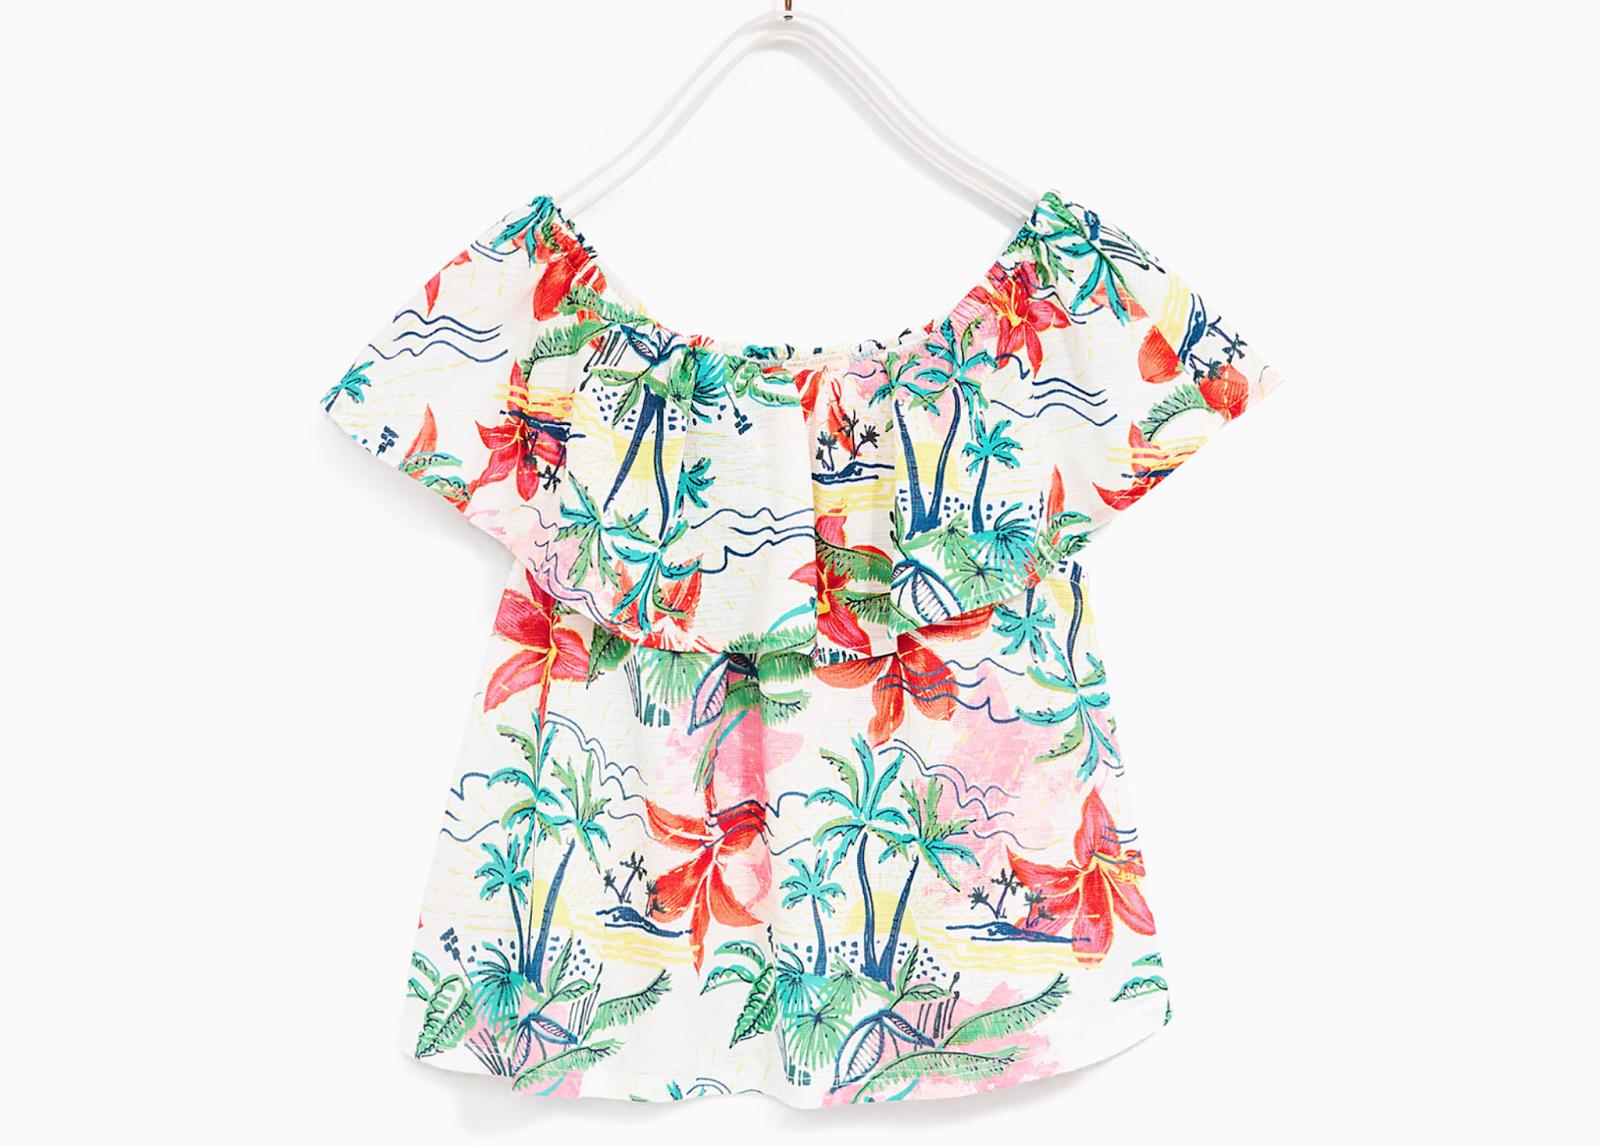 21968bfc9f8 ZARAキッズベビー春夏服が可愛い!通販サイトが便利でお得!返品送料も ...